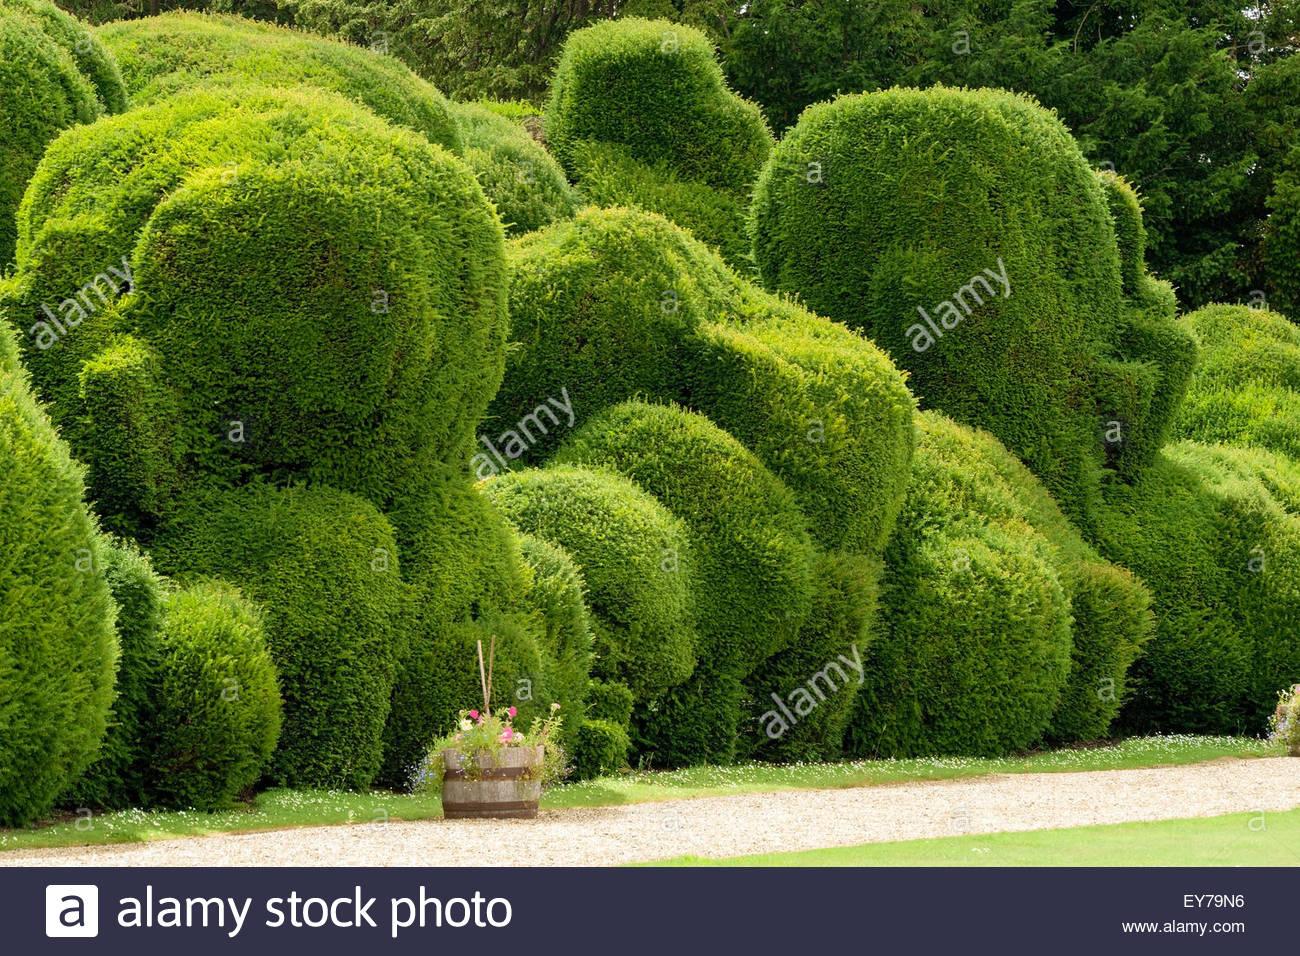 Elephant Hedge In Landscaped Gardens Of Rockingham Castle,  Northamptonshire, England, UK